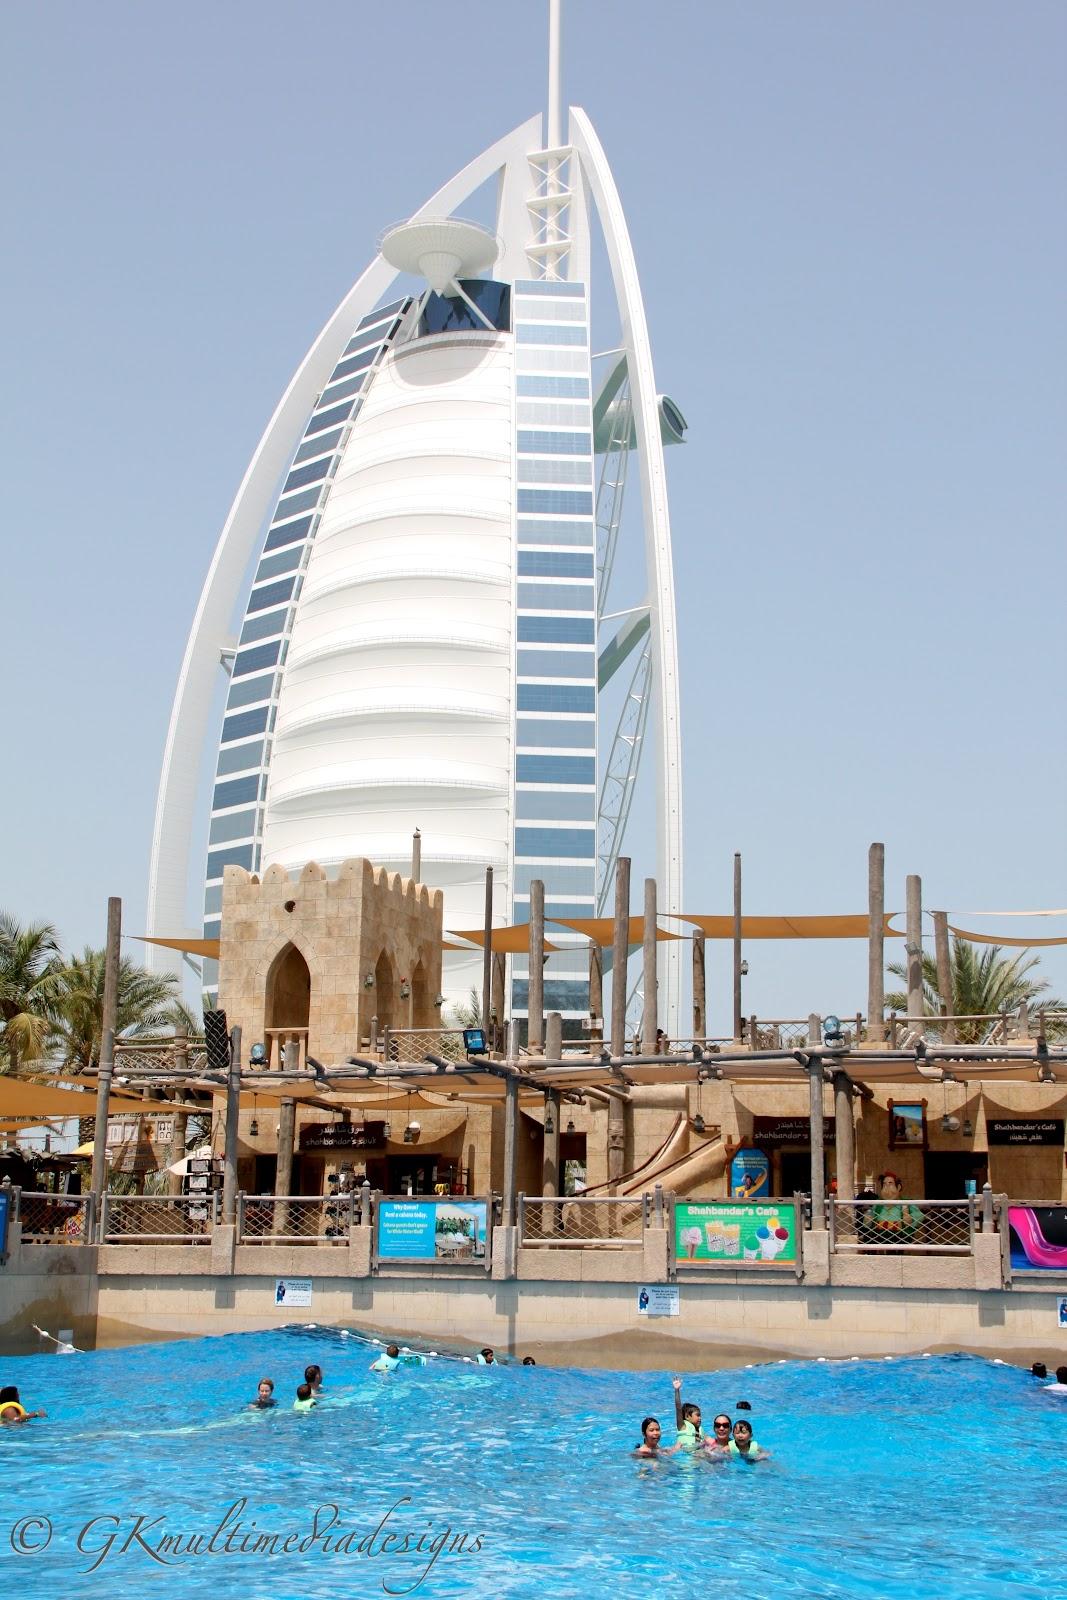 7 Star Hotel Rooms: Anything Under The Sun: Burj Al Arab